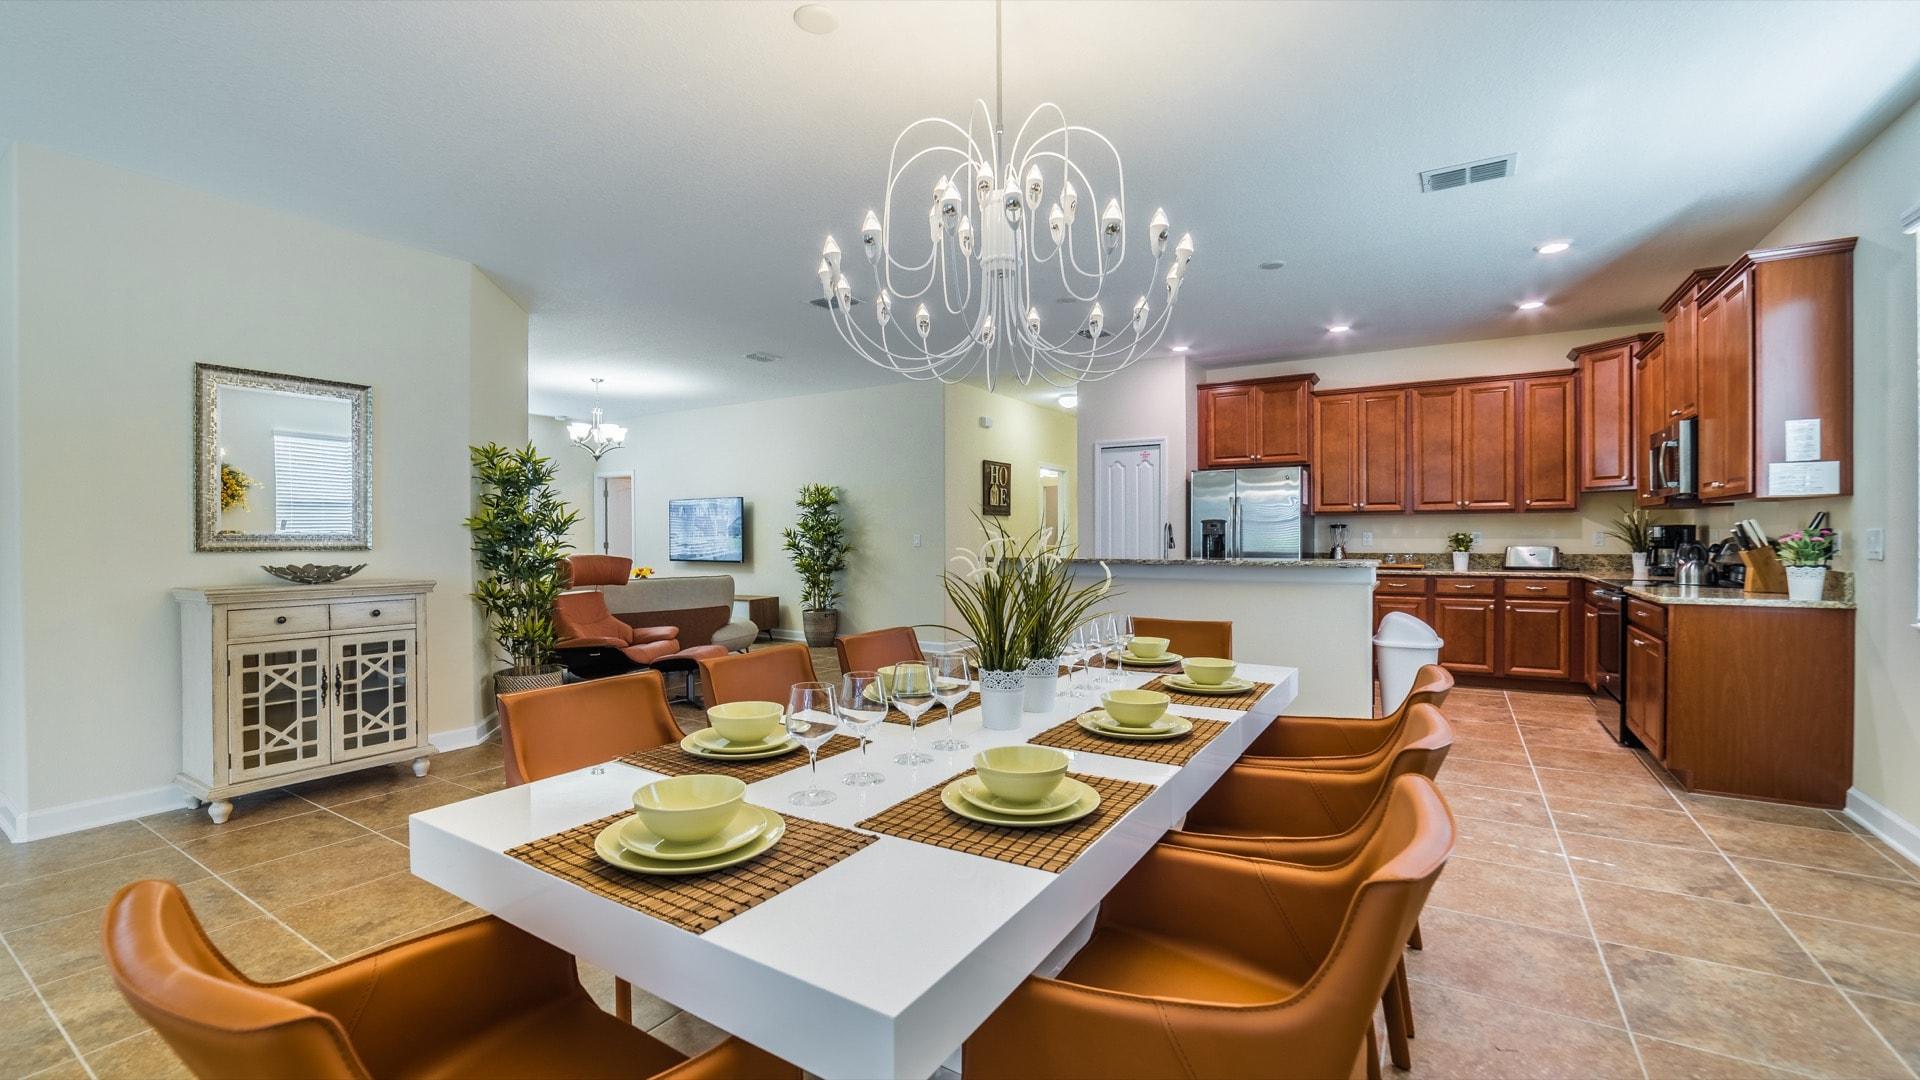 Dining Room (Angle)